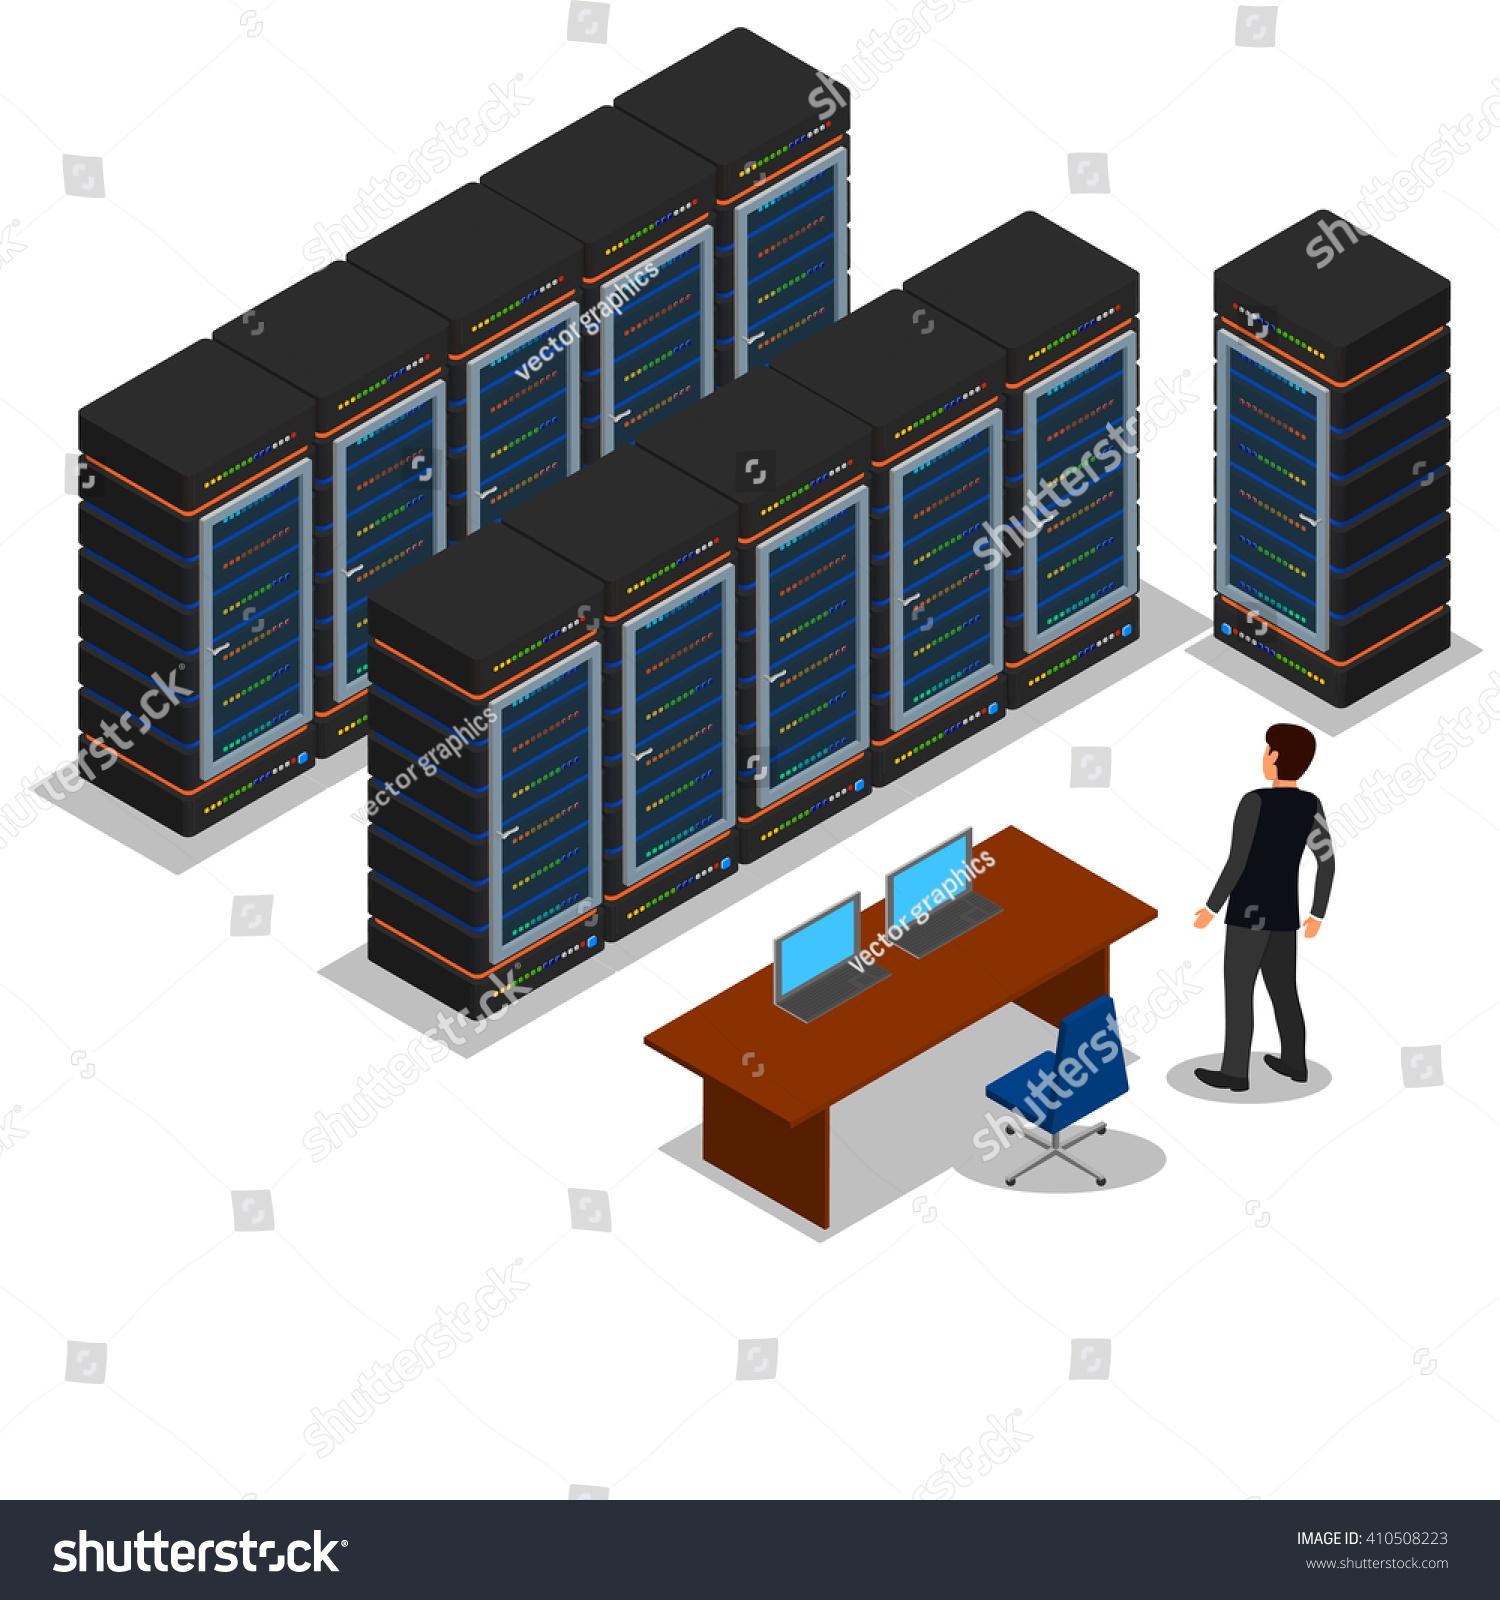 Vector Isometric Rooms Icon Stock Vector: Isometric View Server Room Server Vector Stock Vector